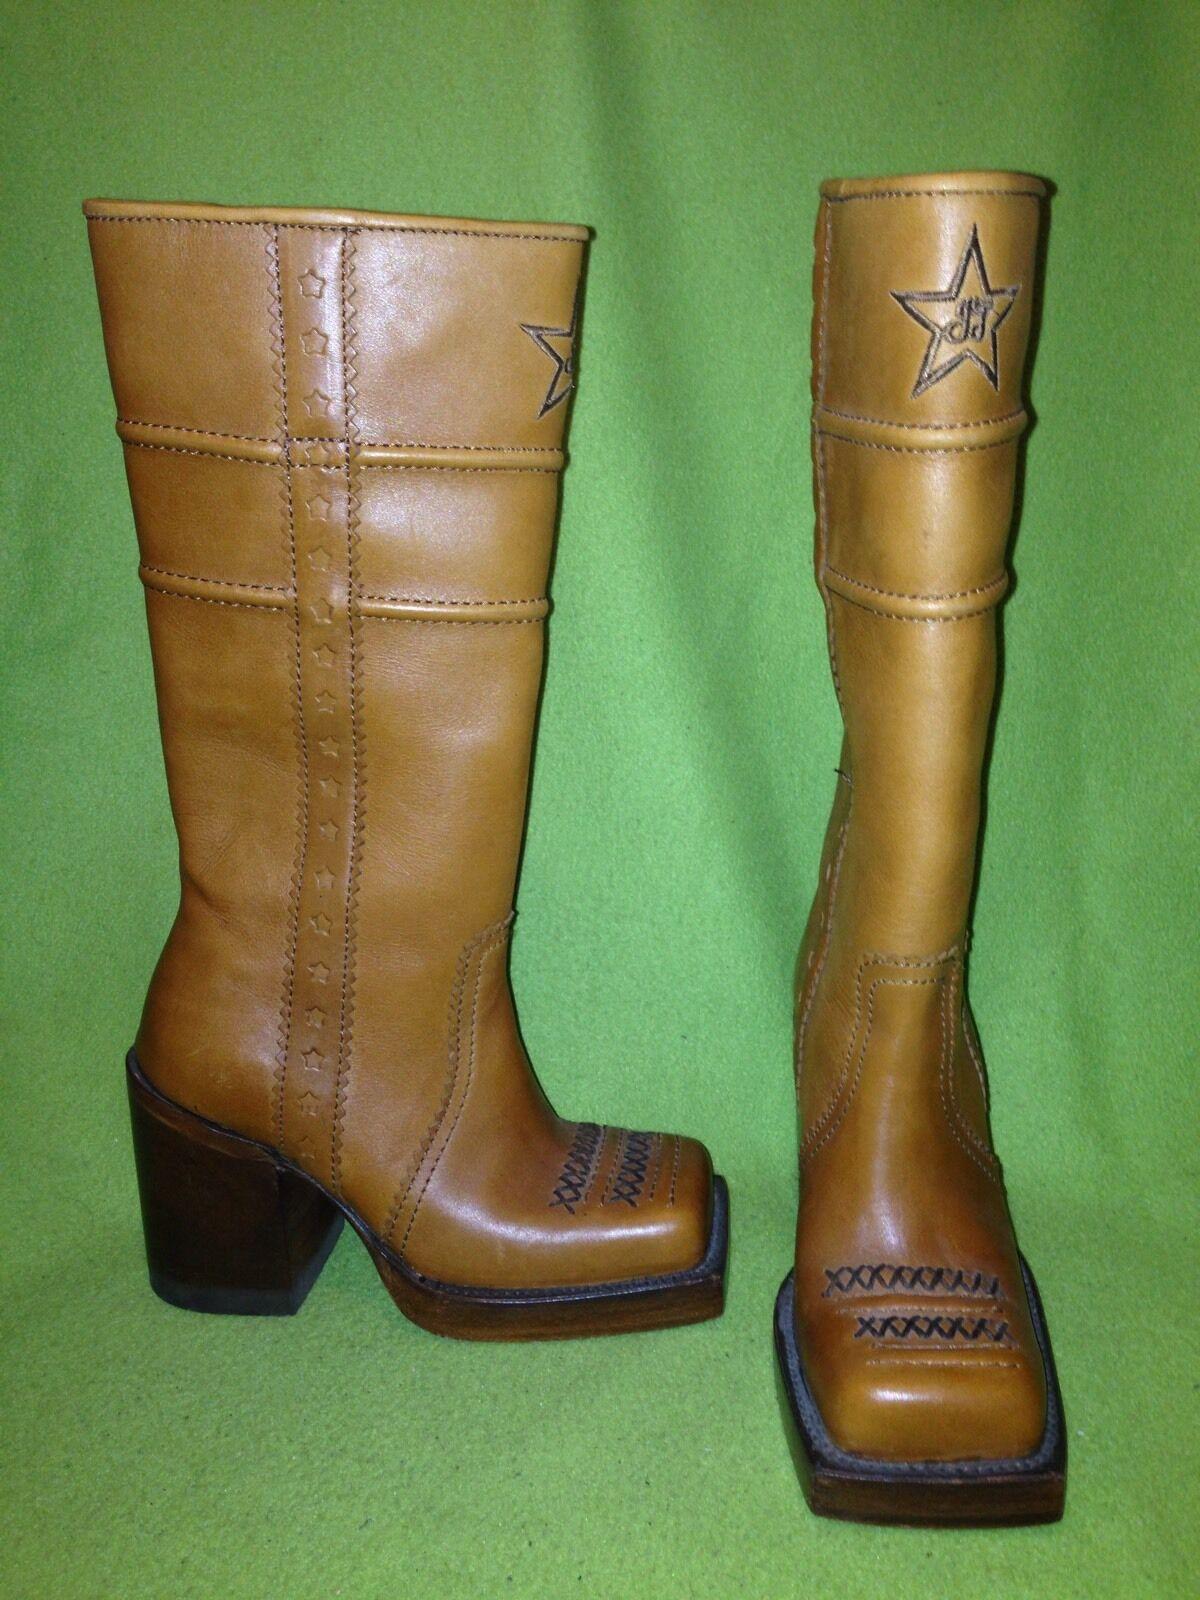 Vintage bspringaaa Fluevog Western Knee höga stövlar 5 5 5  stor rabatt